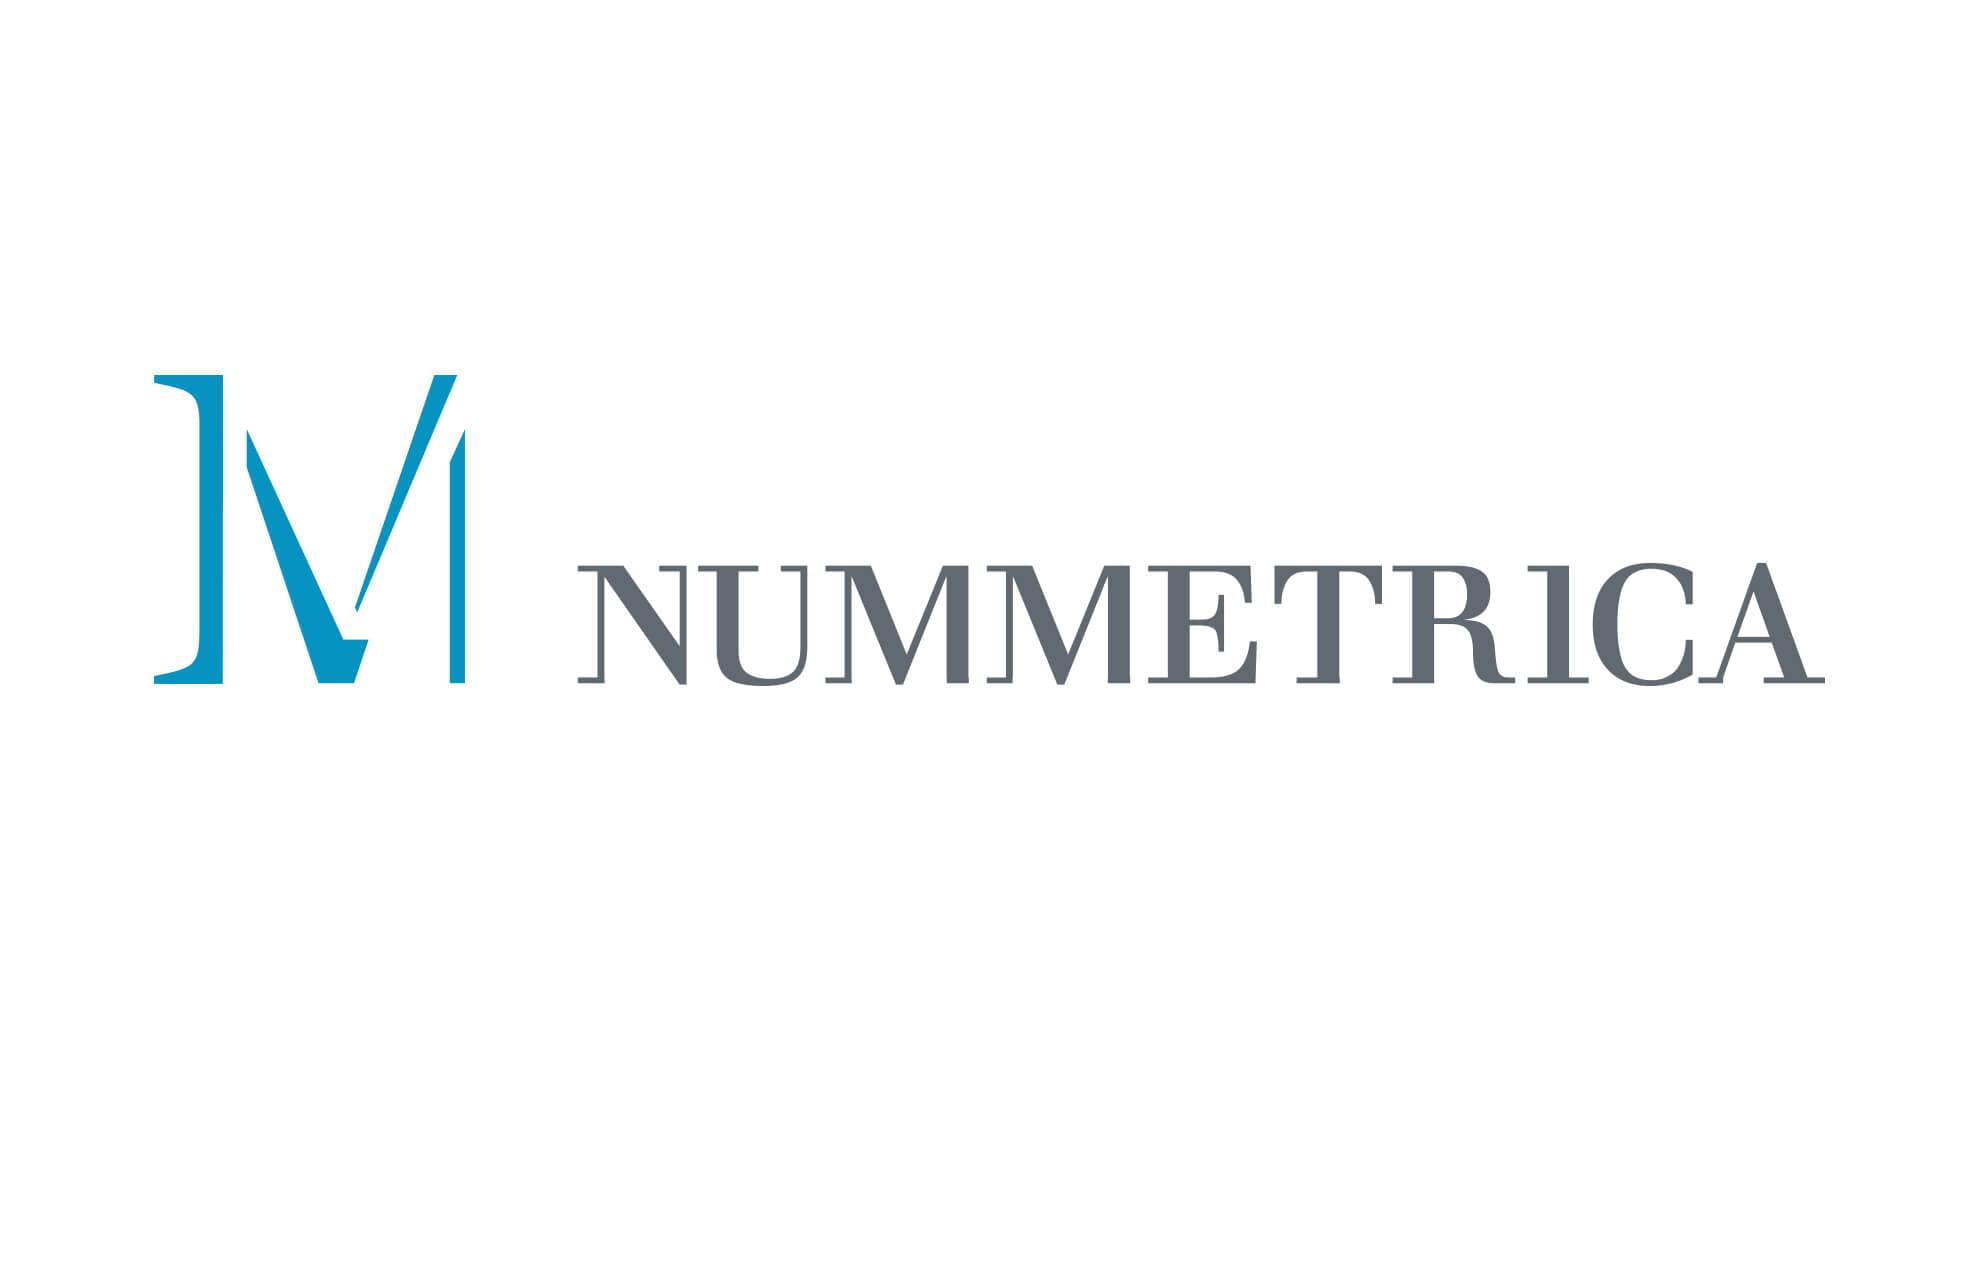 nummetrica design logo1 - Branding. Identidad gráfica. Numismática